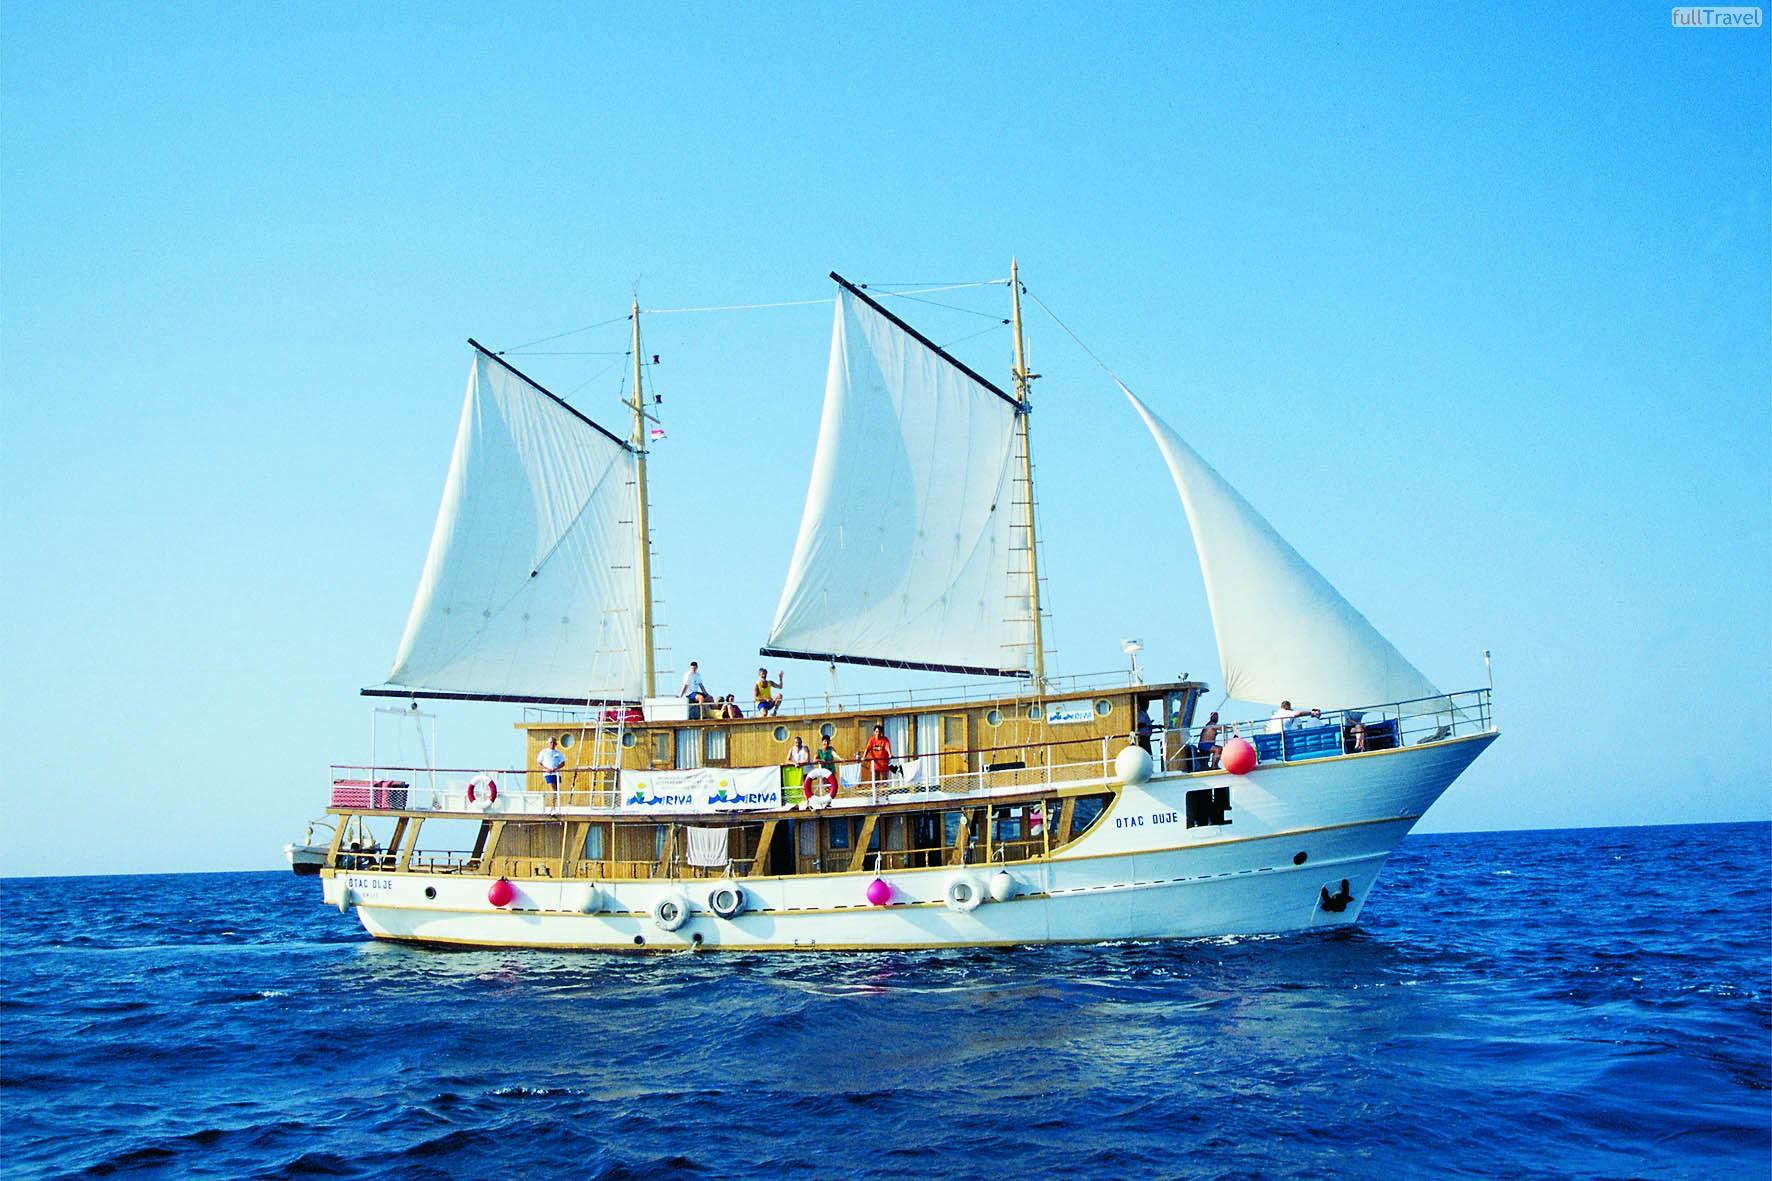 In Croazia, in barca